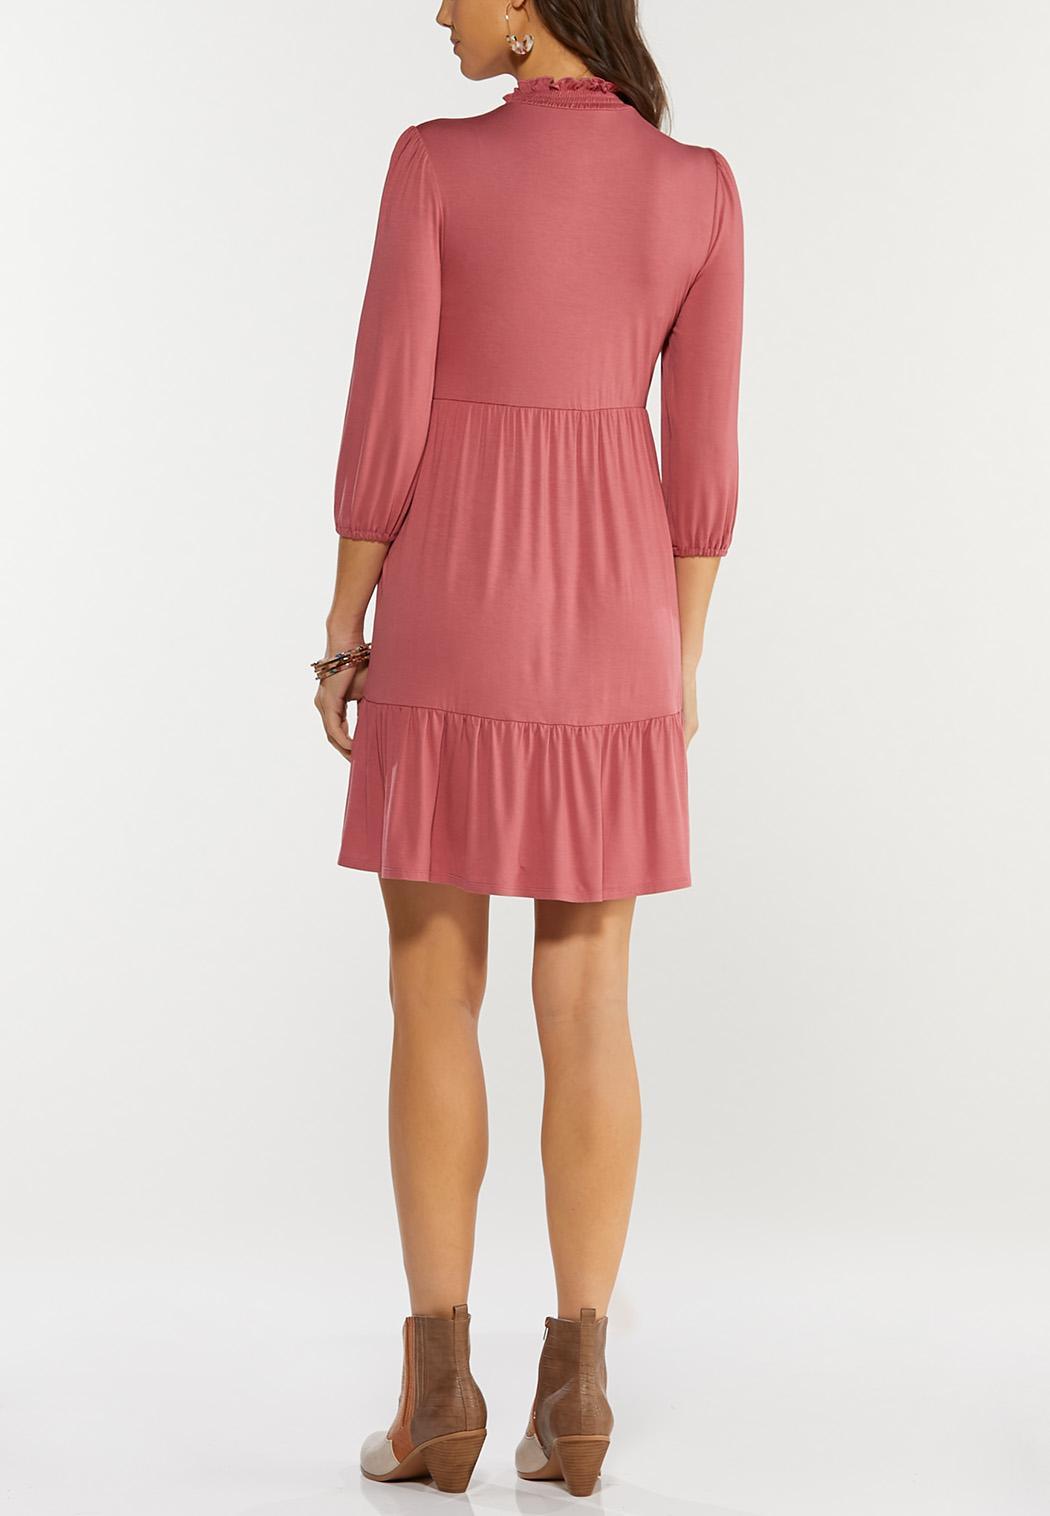 Ruffled Mock Neck Babydoll Dress (Item #44466066)